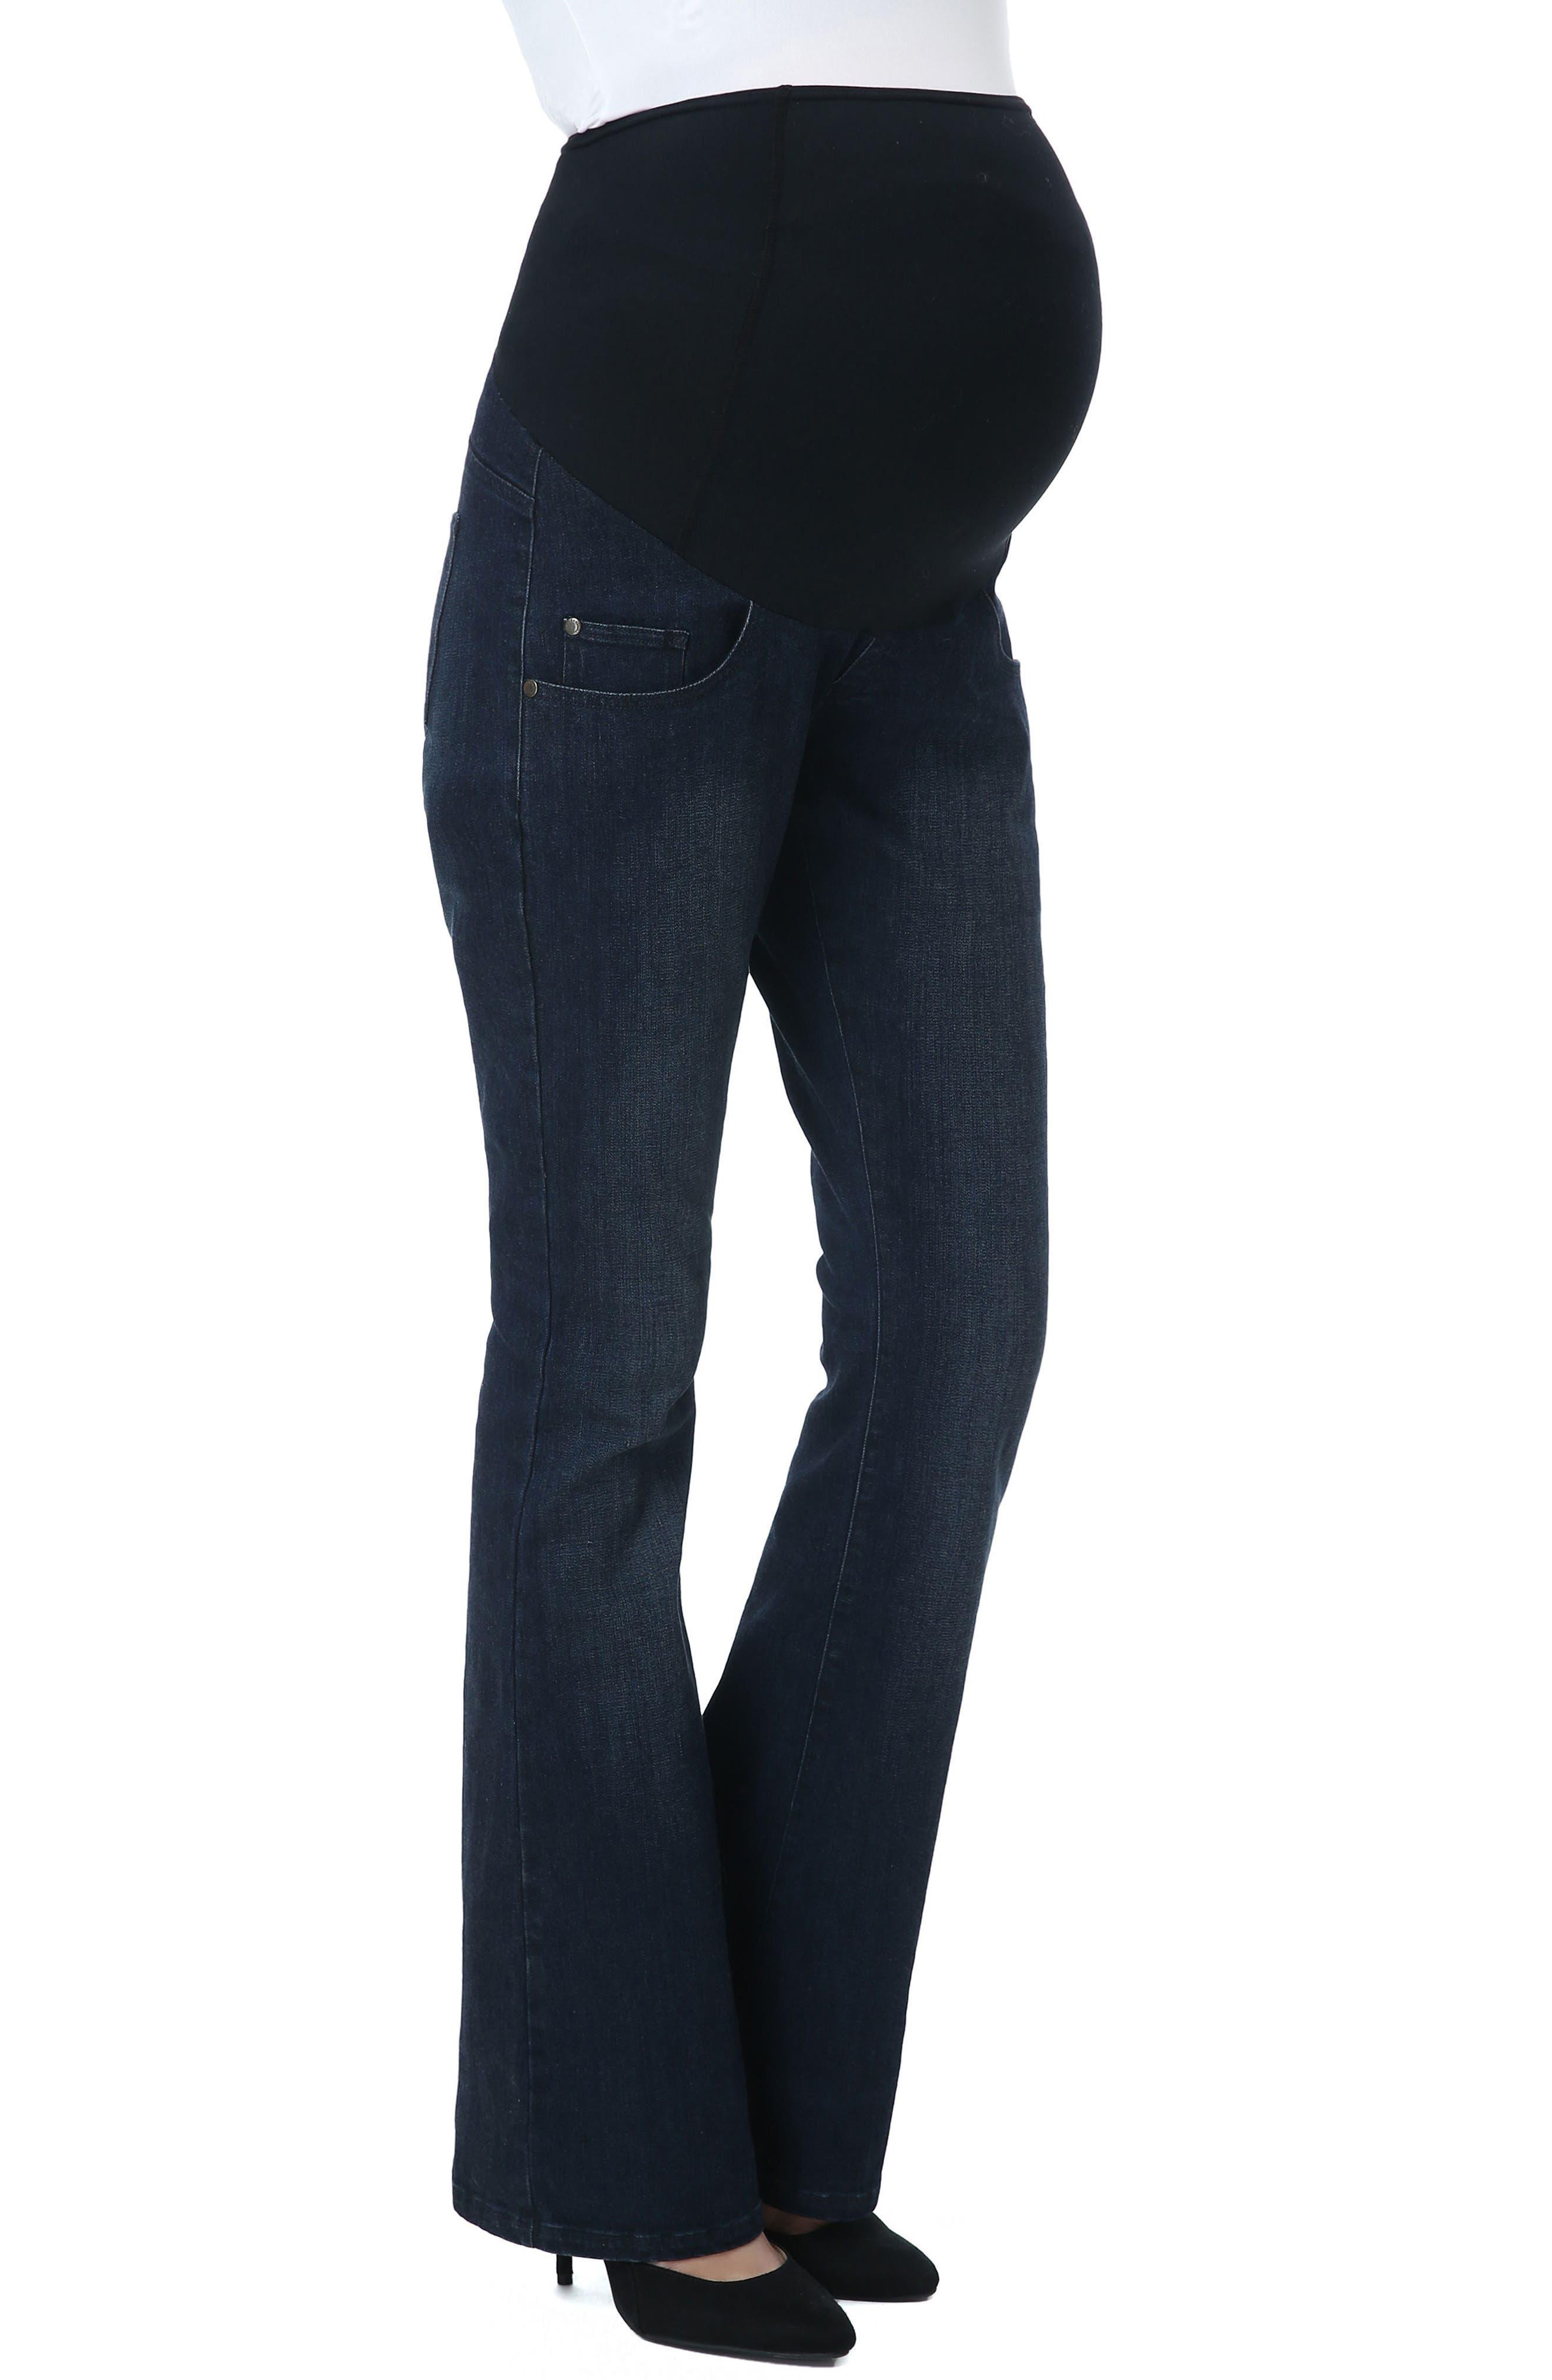 Leni Maternity Bootcut Jeans,                         Main,                         color, Black/ Blue